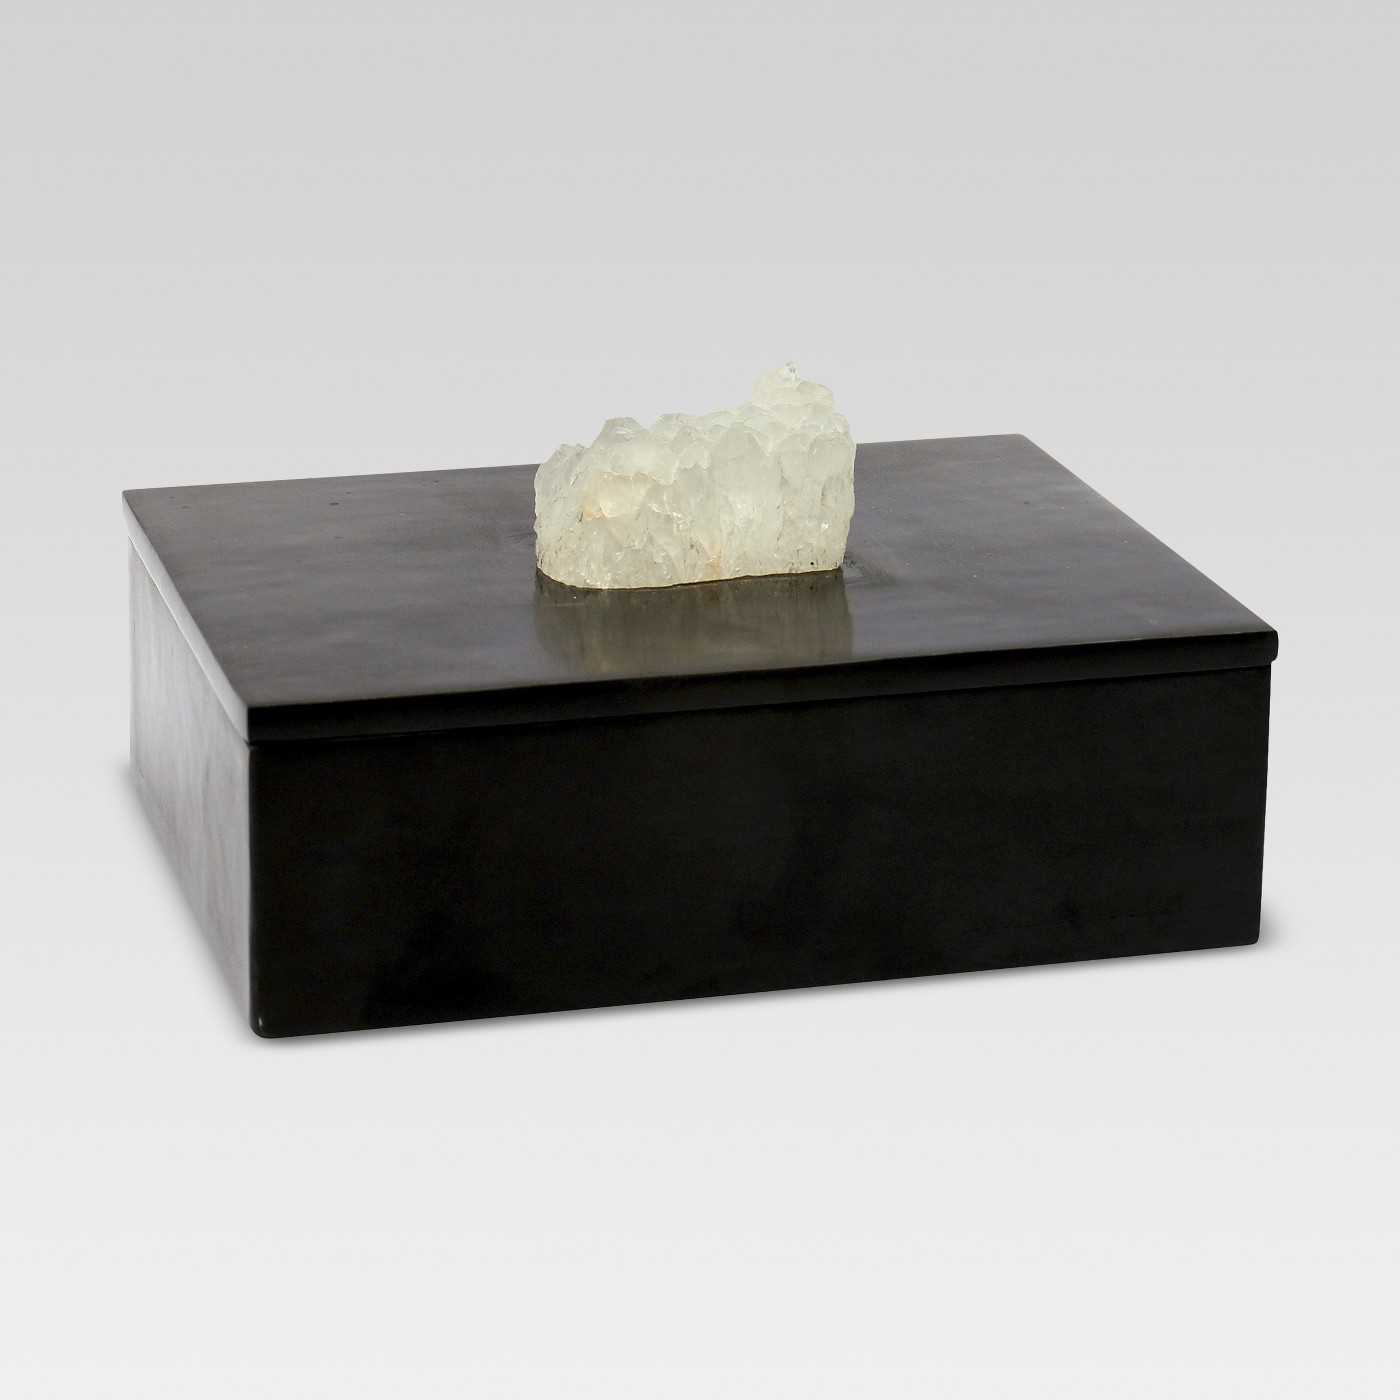 Decorative Box with Agate Stone